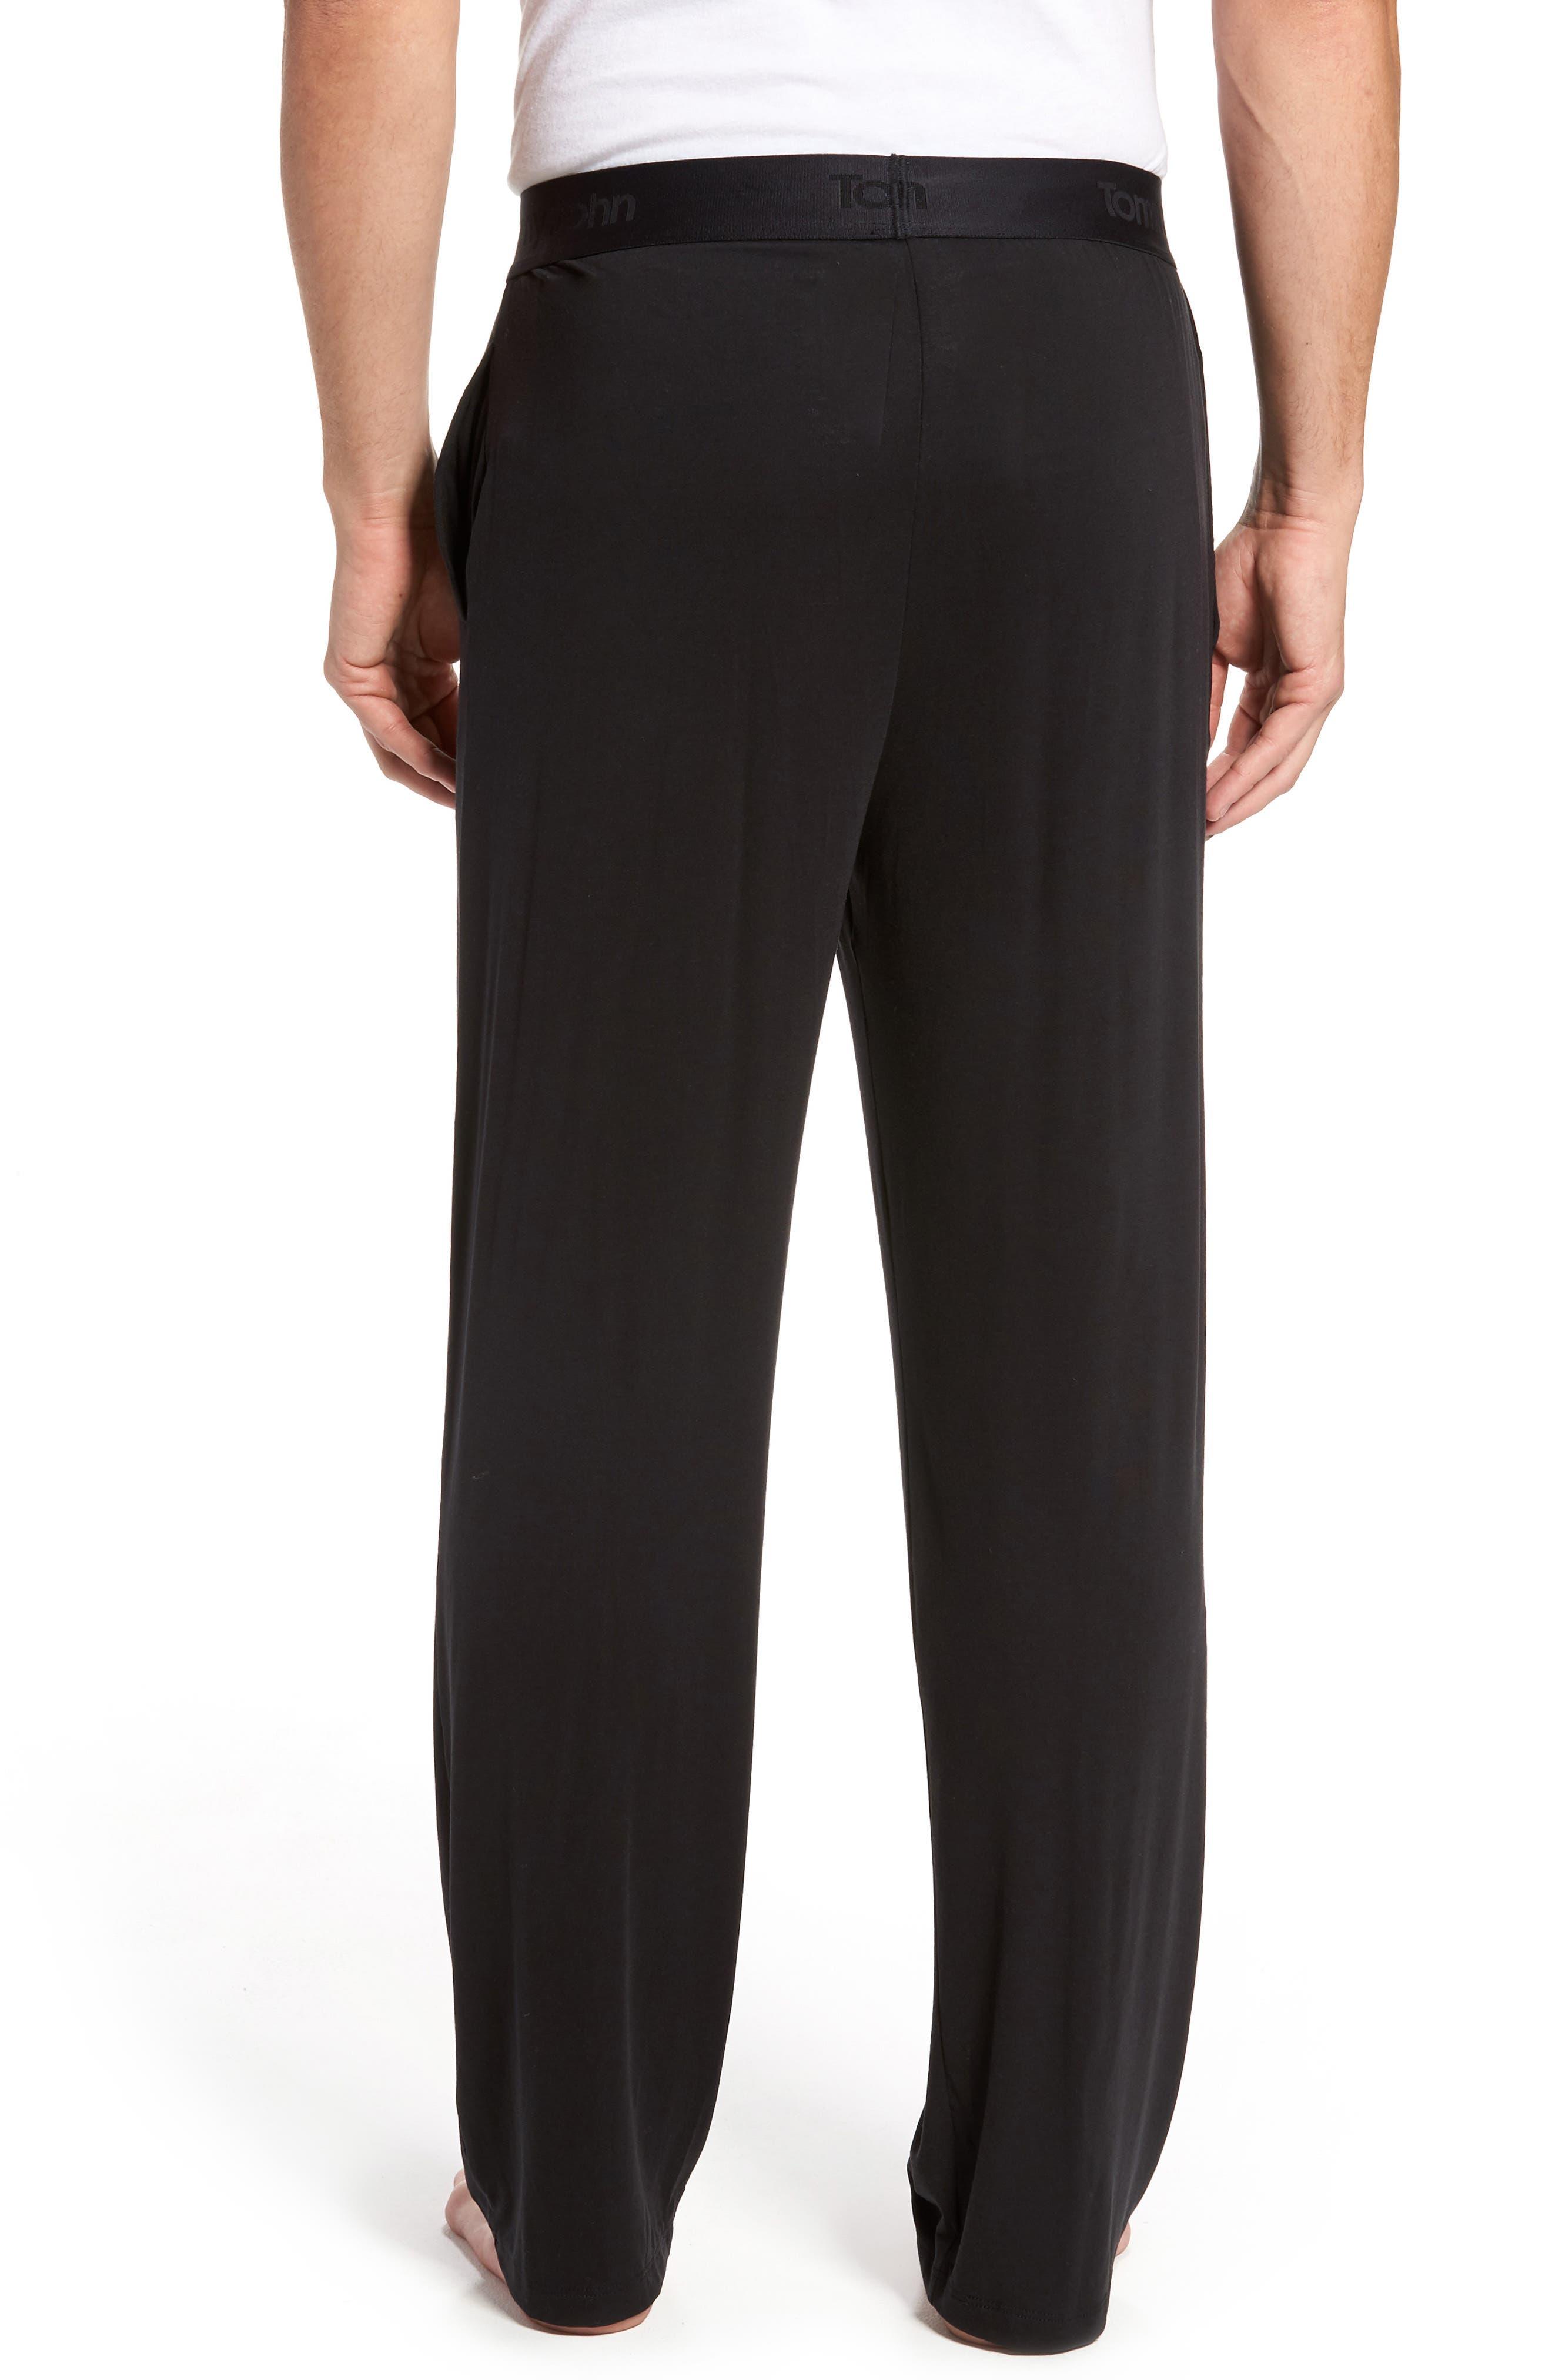 Second Skin Lounge Pants,                             Alternate thumbnail 2, color,                             BLACK